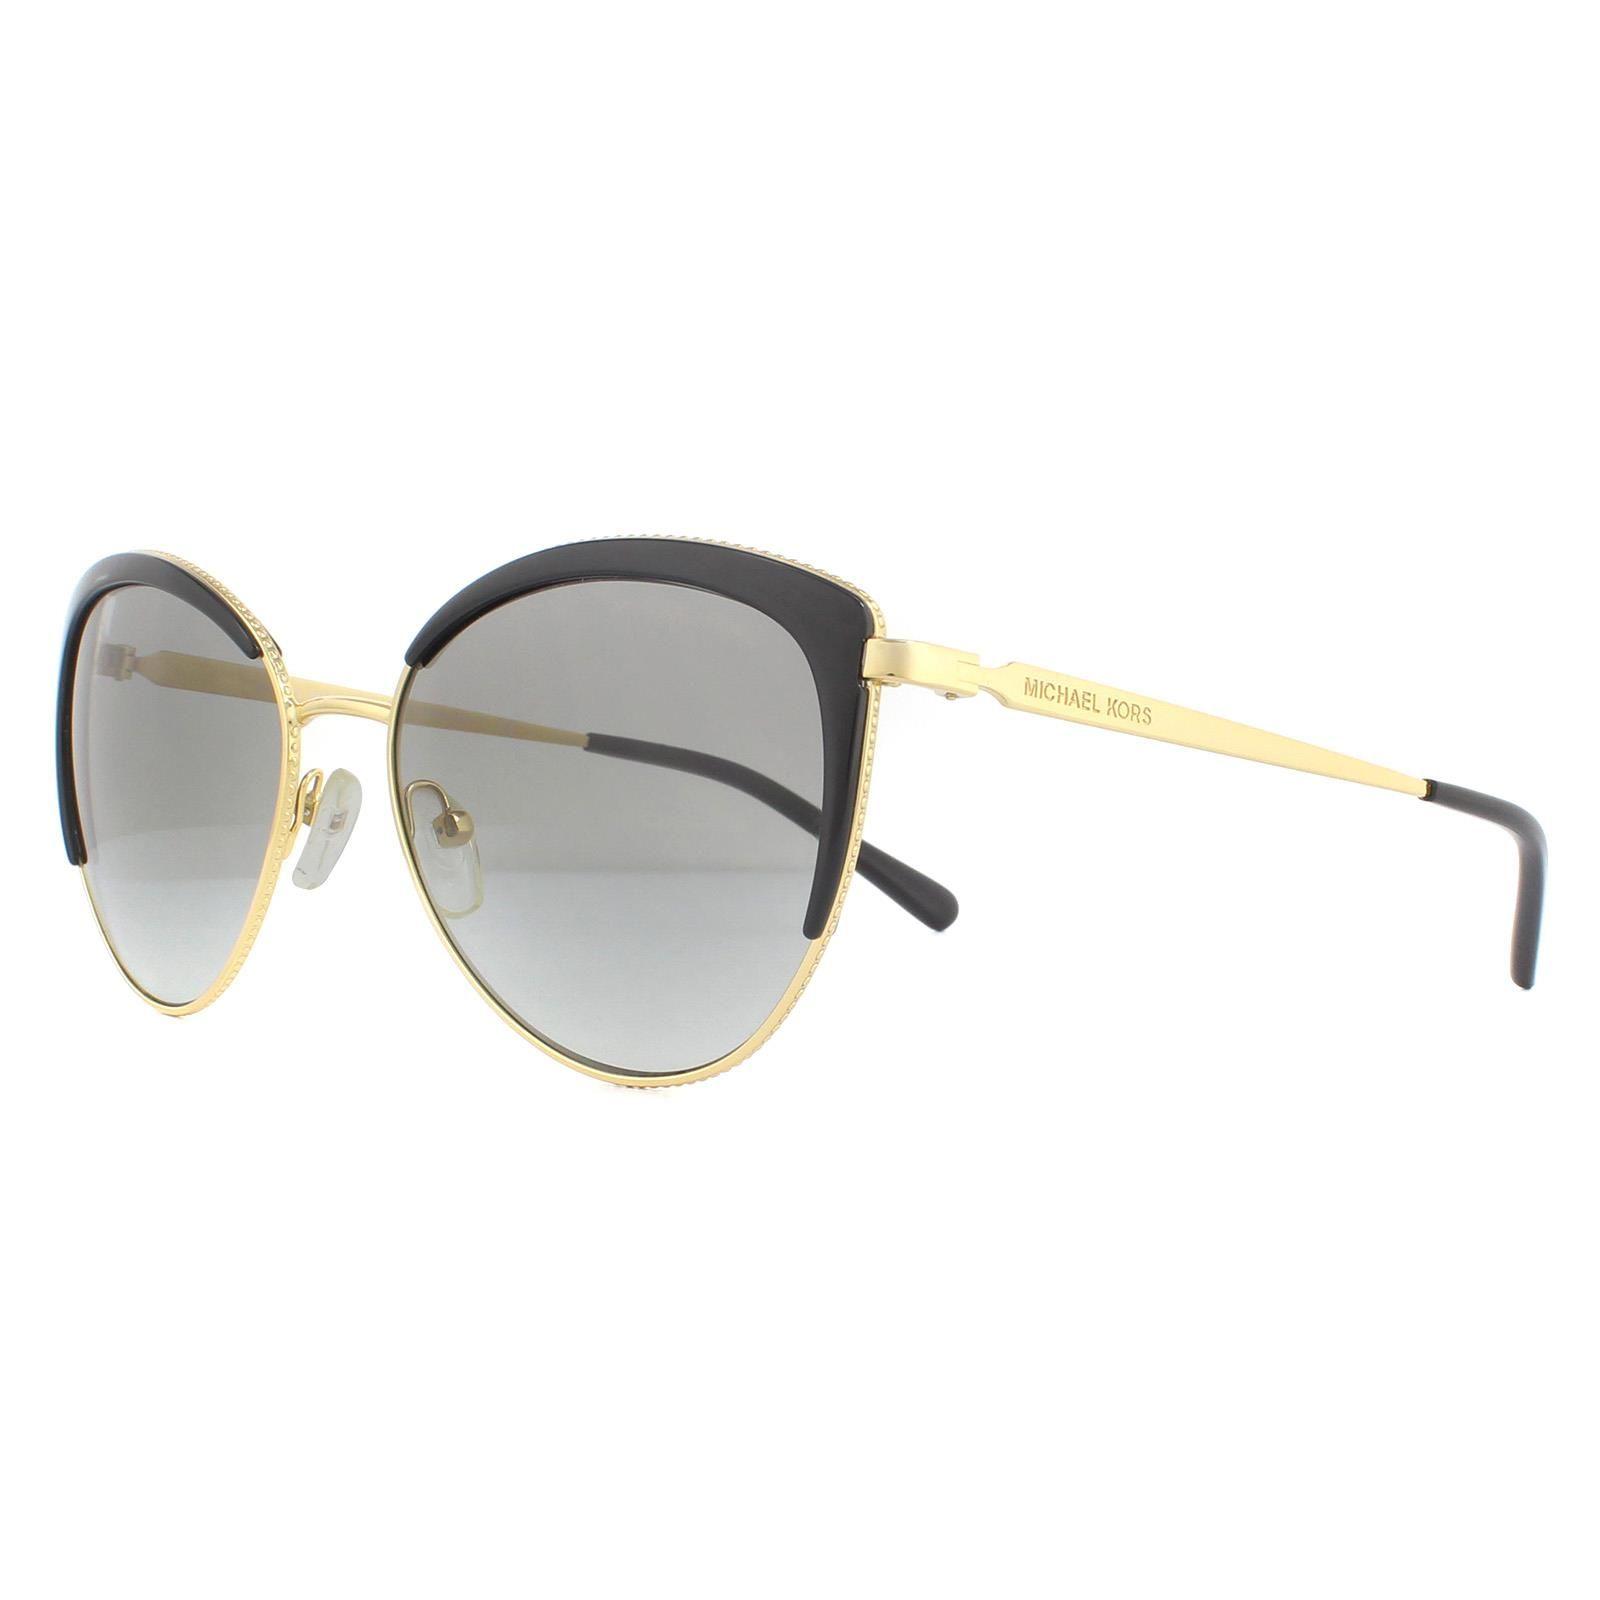 Michael Kors Sunglasses Biscayne MK1046 110011 Light Gold Black Dark Grey Gradient